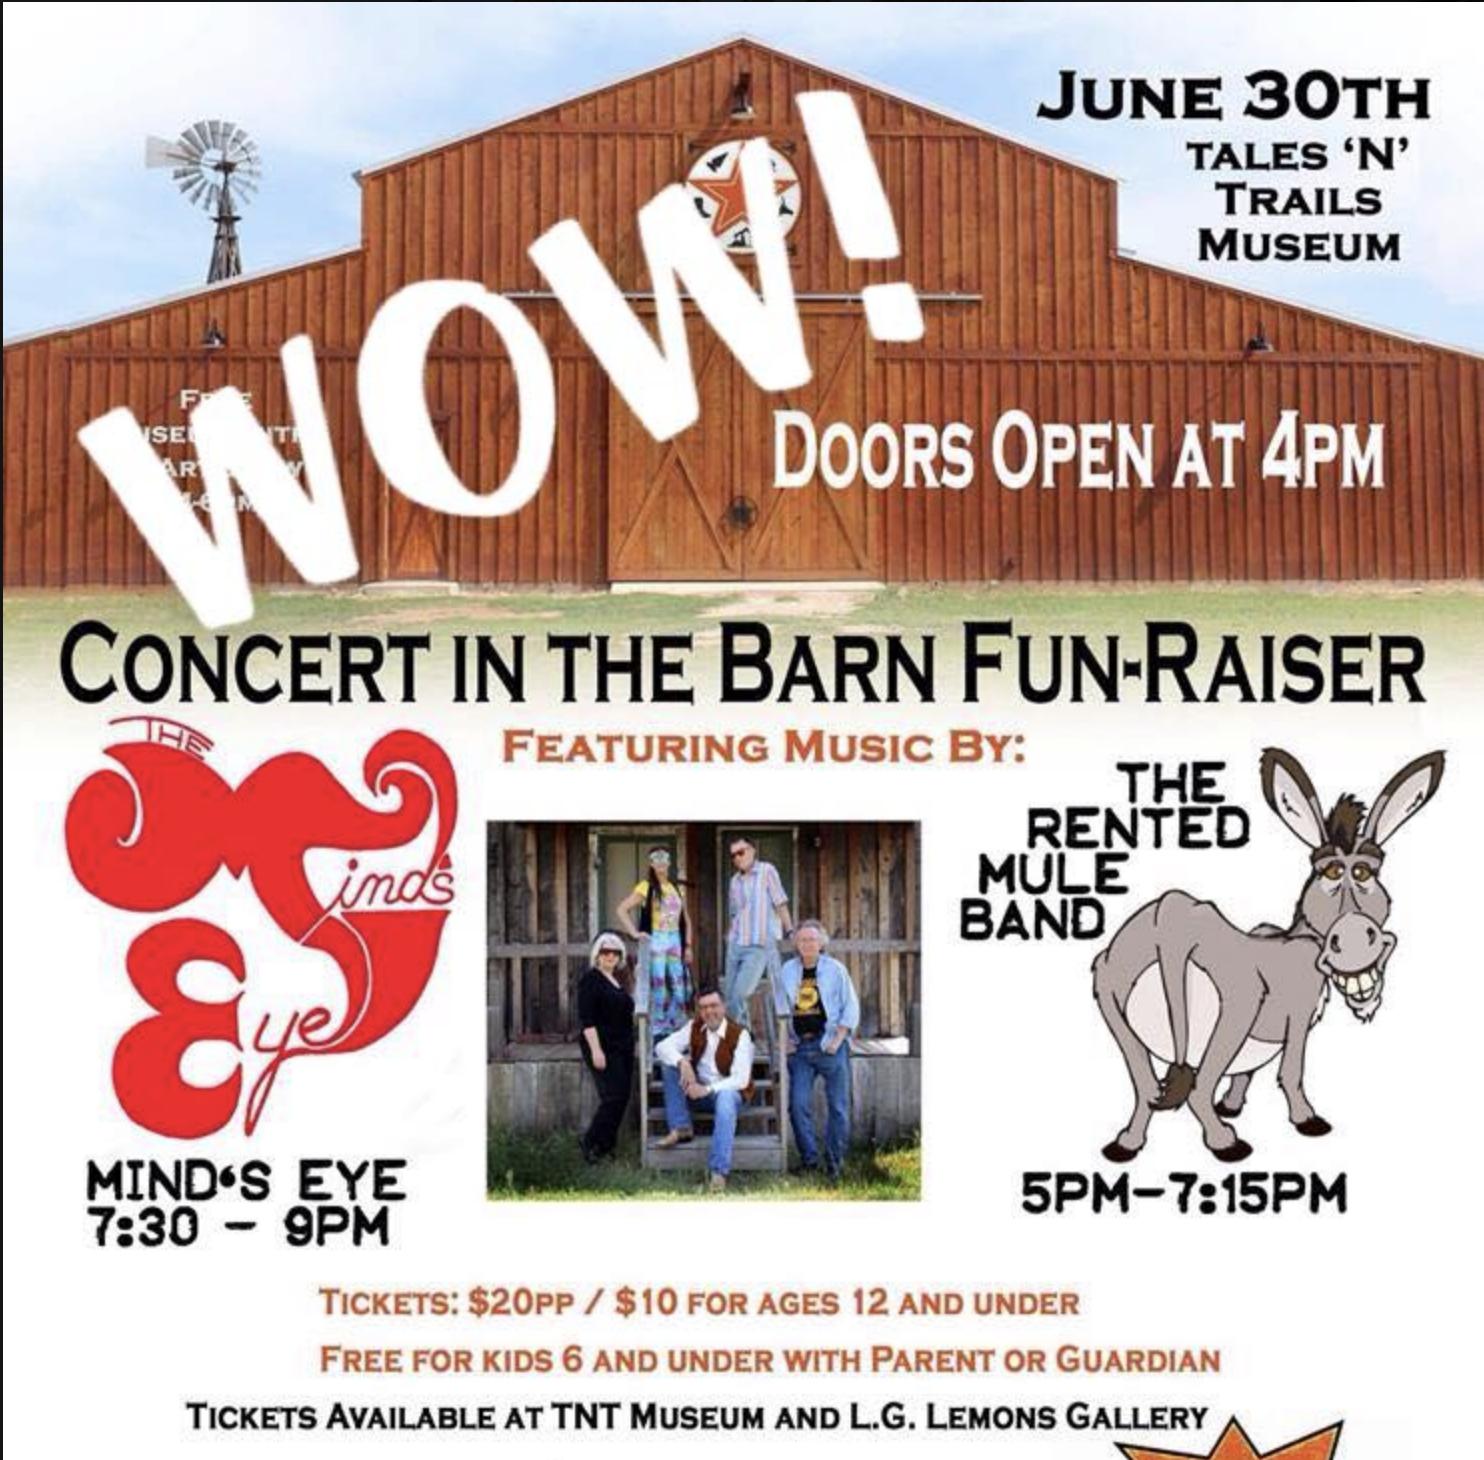 Concert in the Barn Fun-Raiser